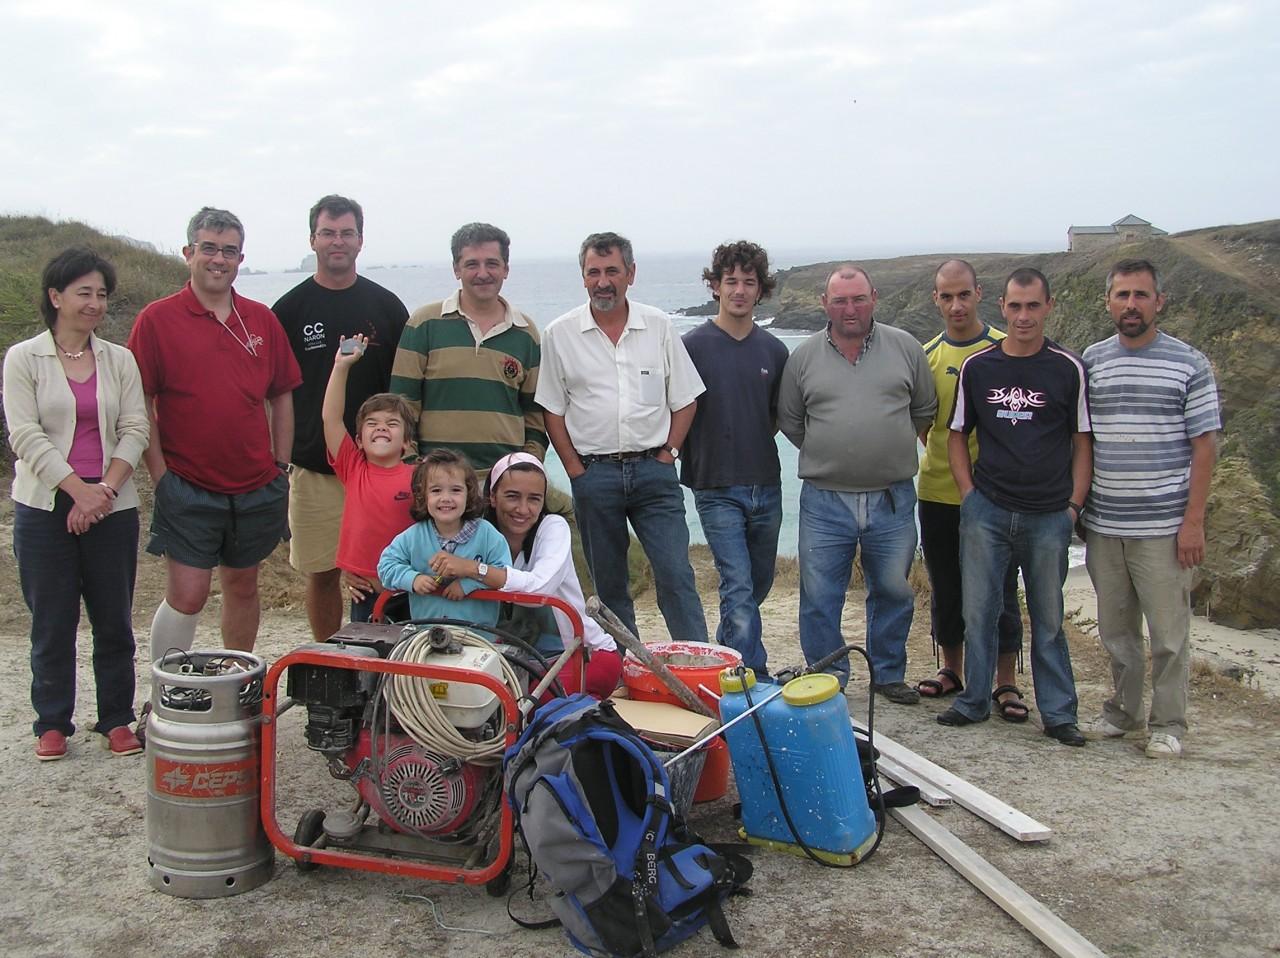 restauracion-hermida-santa-comba-a-2006